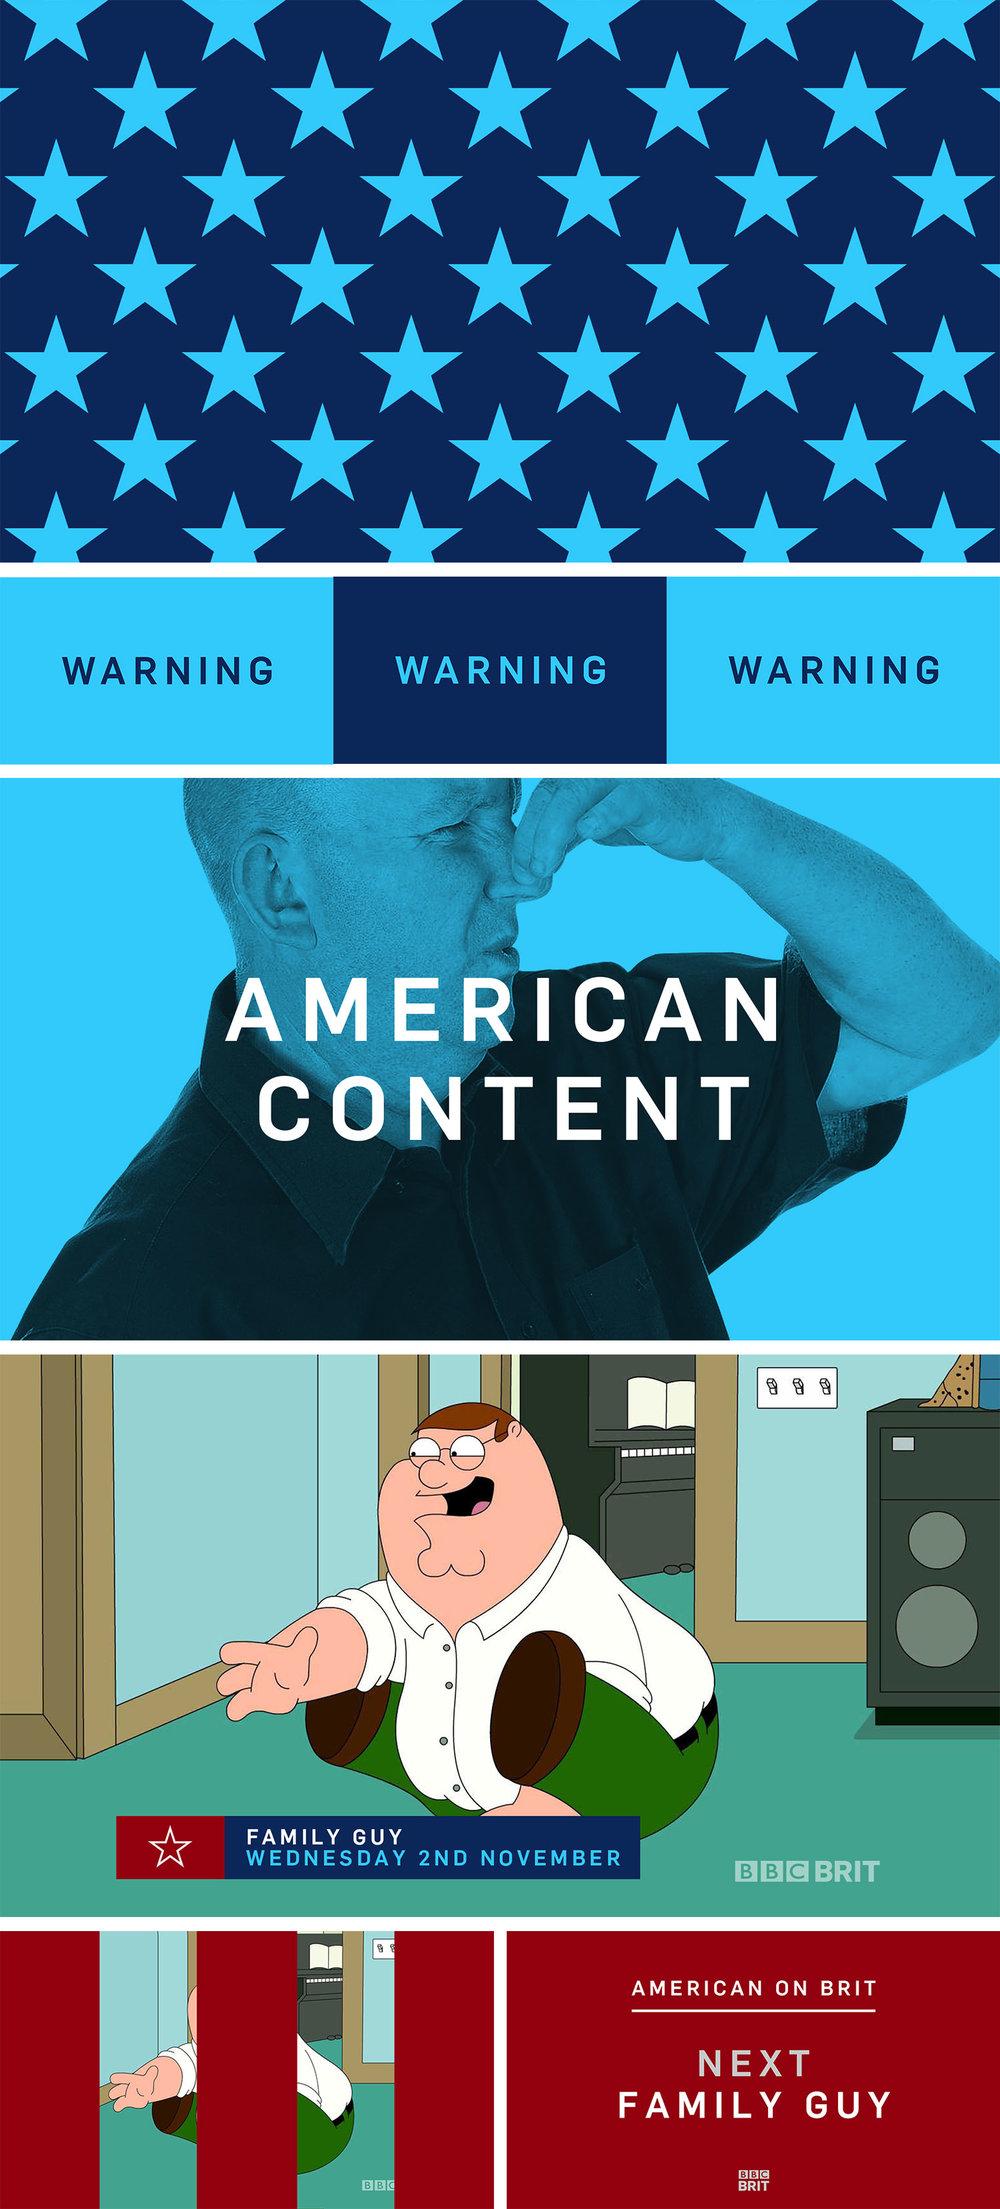 bbcbrit_american_rev.jpg